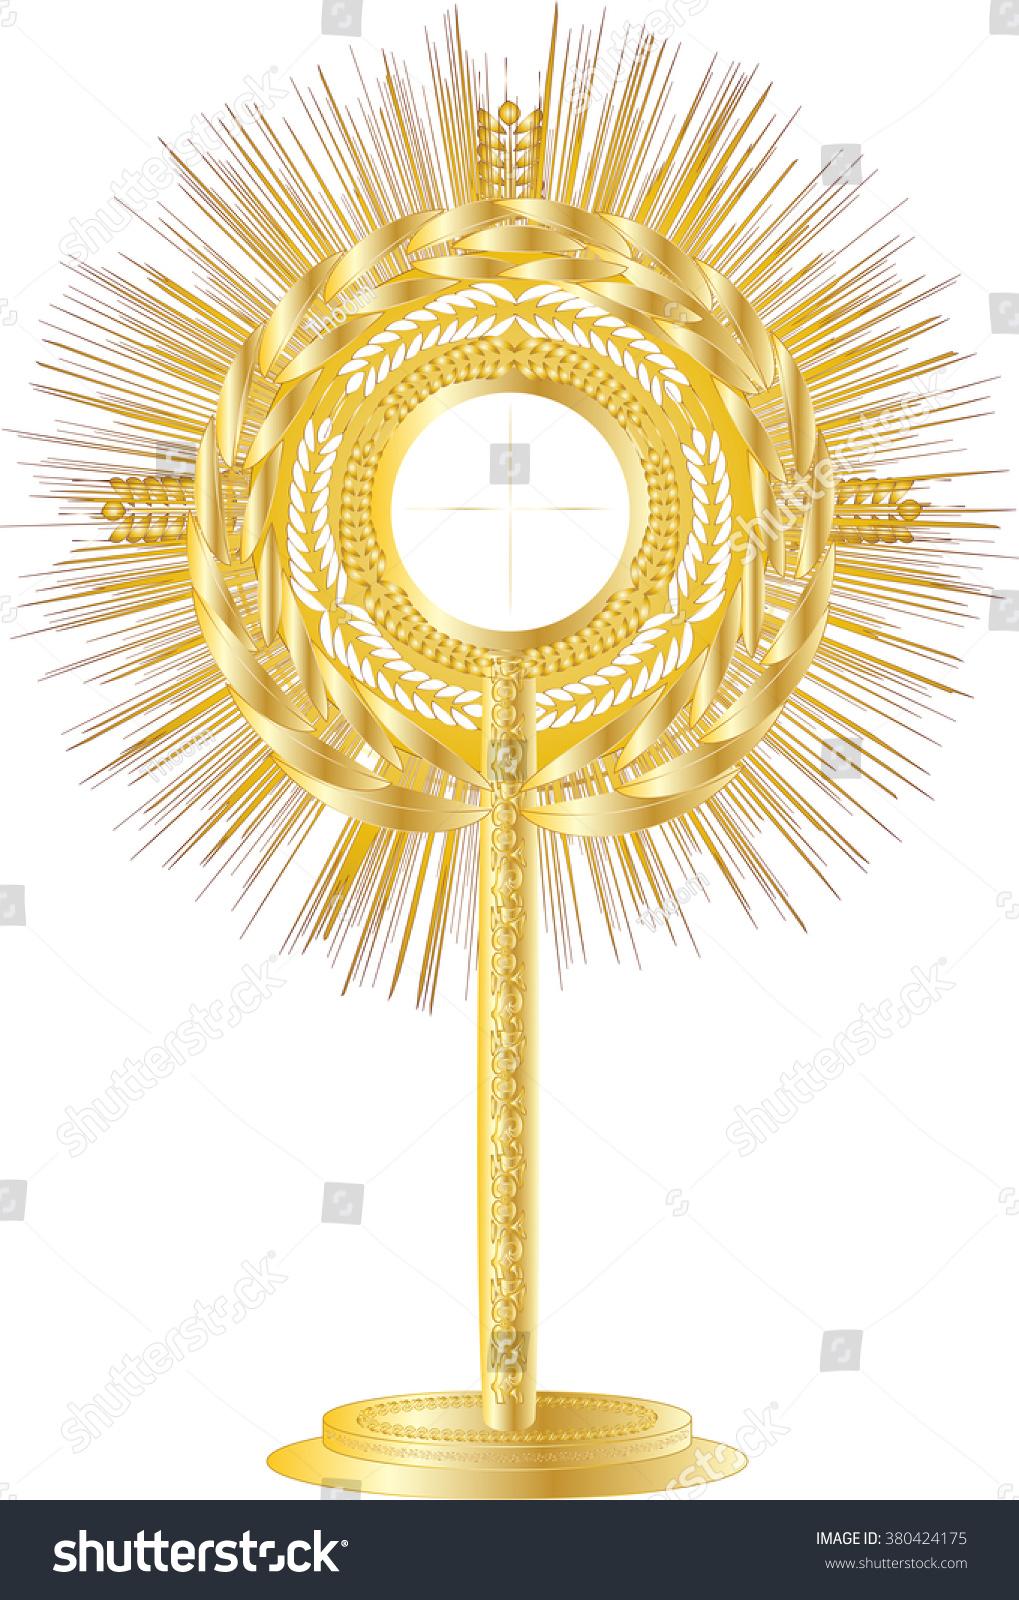 Golden Monstrance Eucharistic Adoration Blessed Sacrament Stock ...